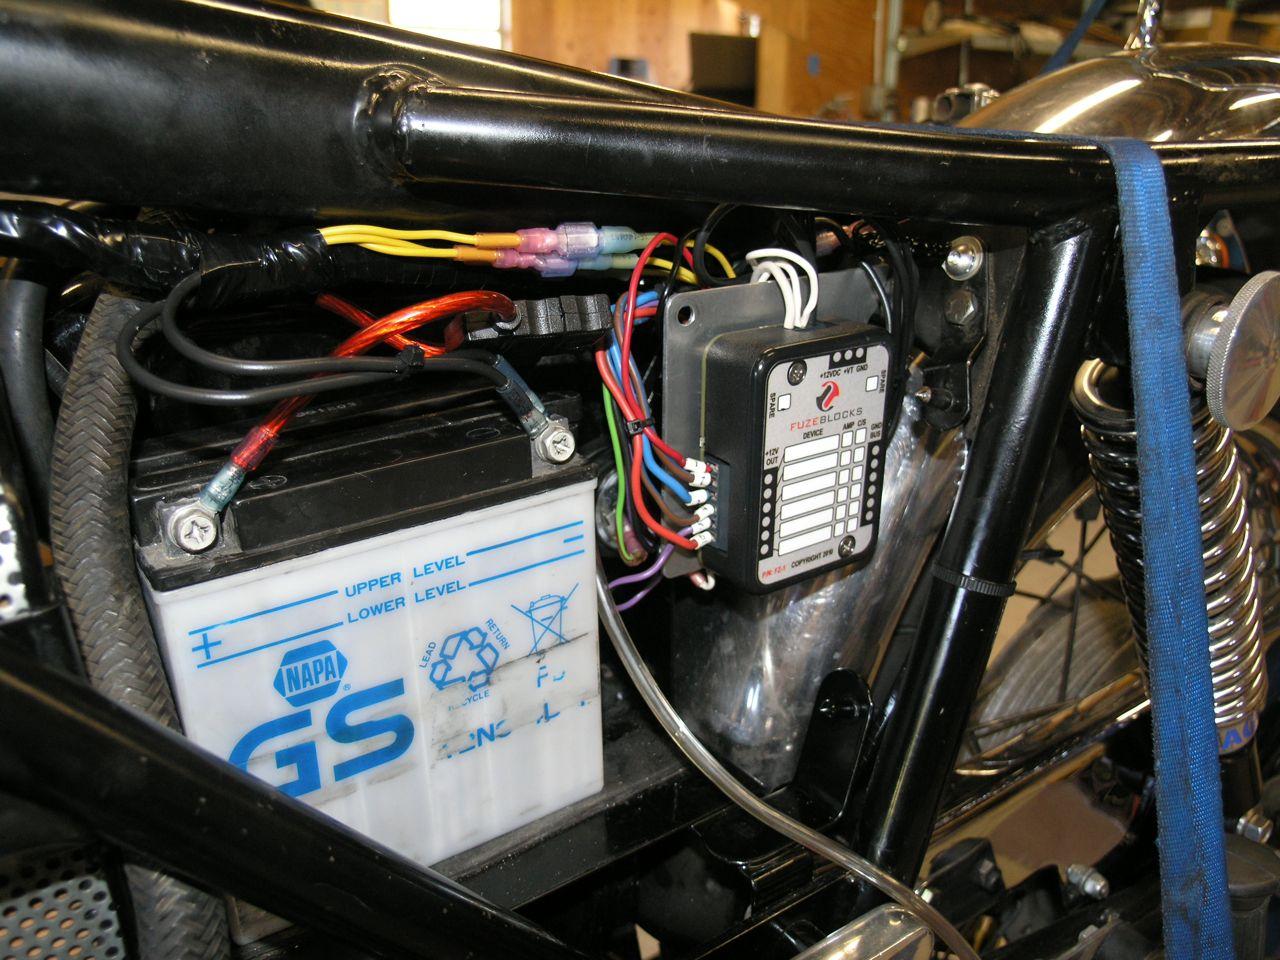 67 Gas Tank Sender Wiring Harness Images Of Home Design 1968 Camaro Fuel Sending Unit Diagram 70 Dodge